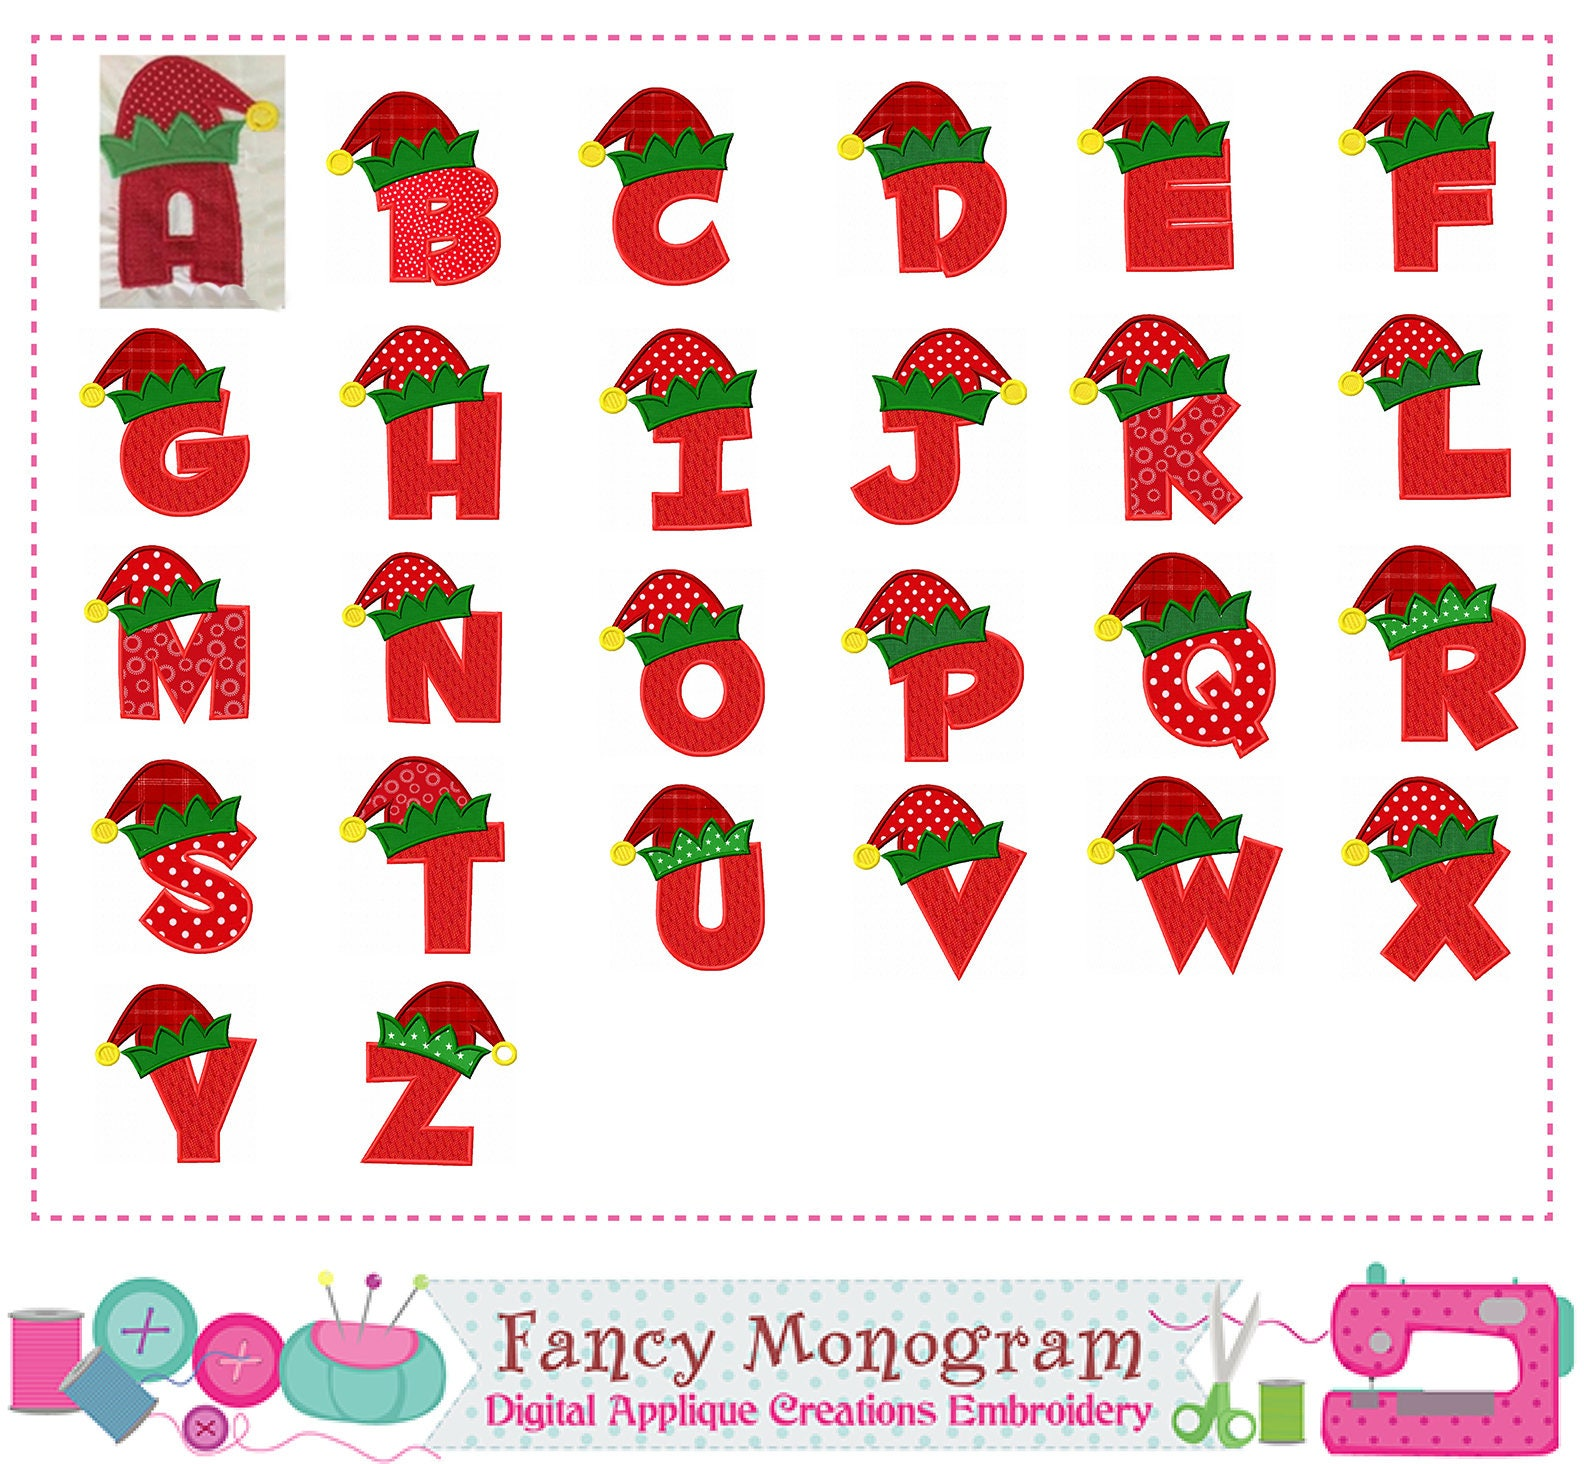 Elf letters appliquechristmas elf monograms appliqueelf etsy - Alphabet noel ...